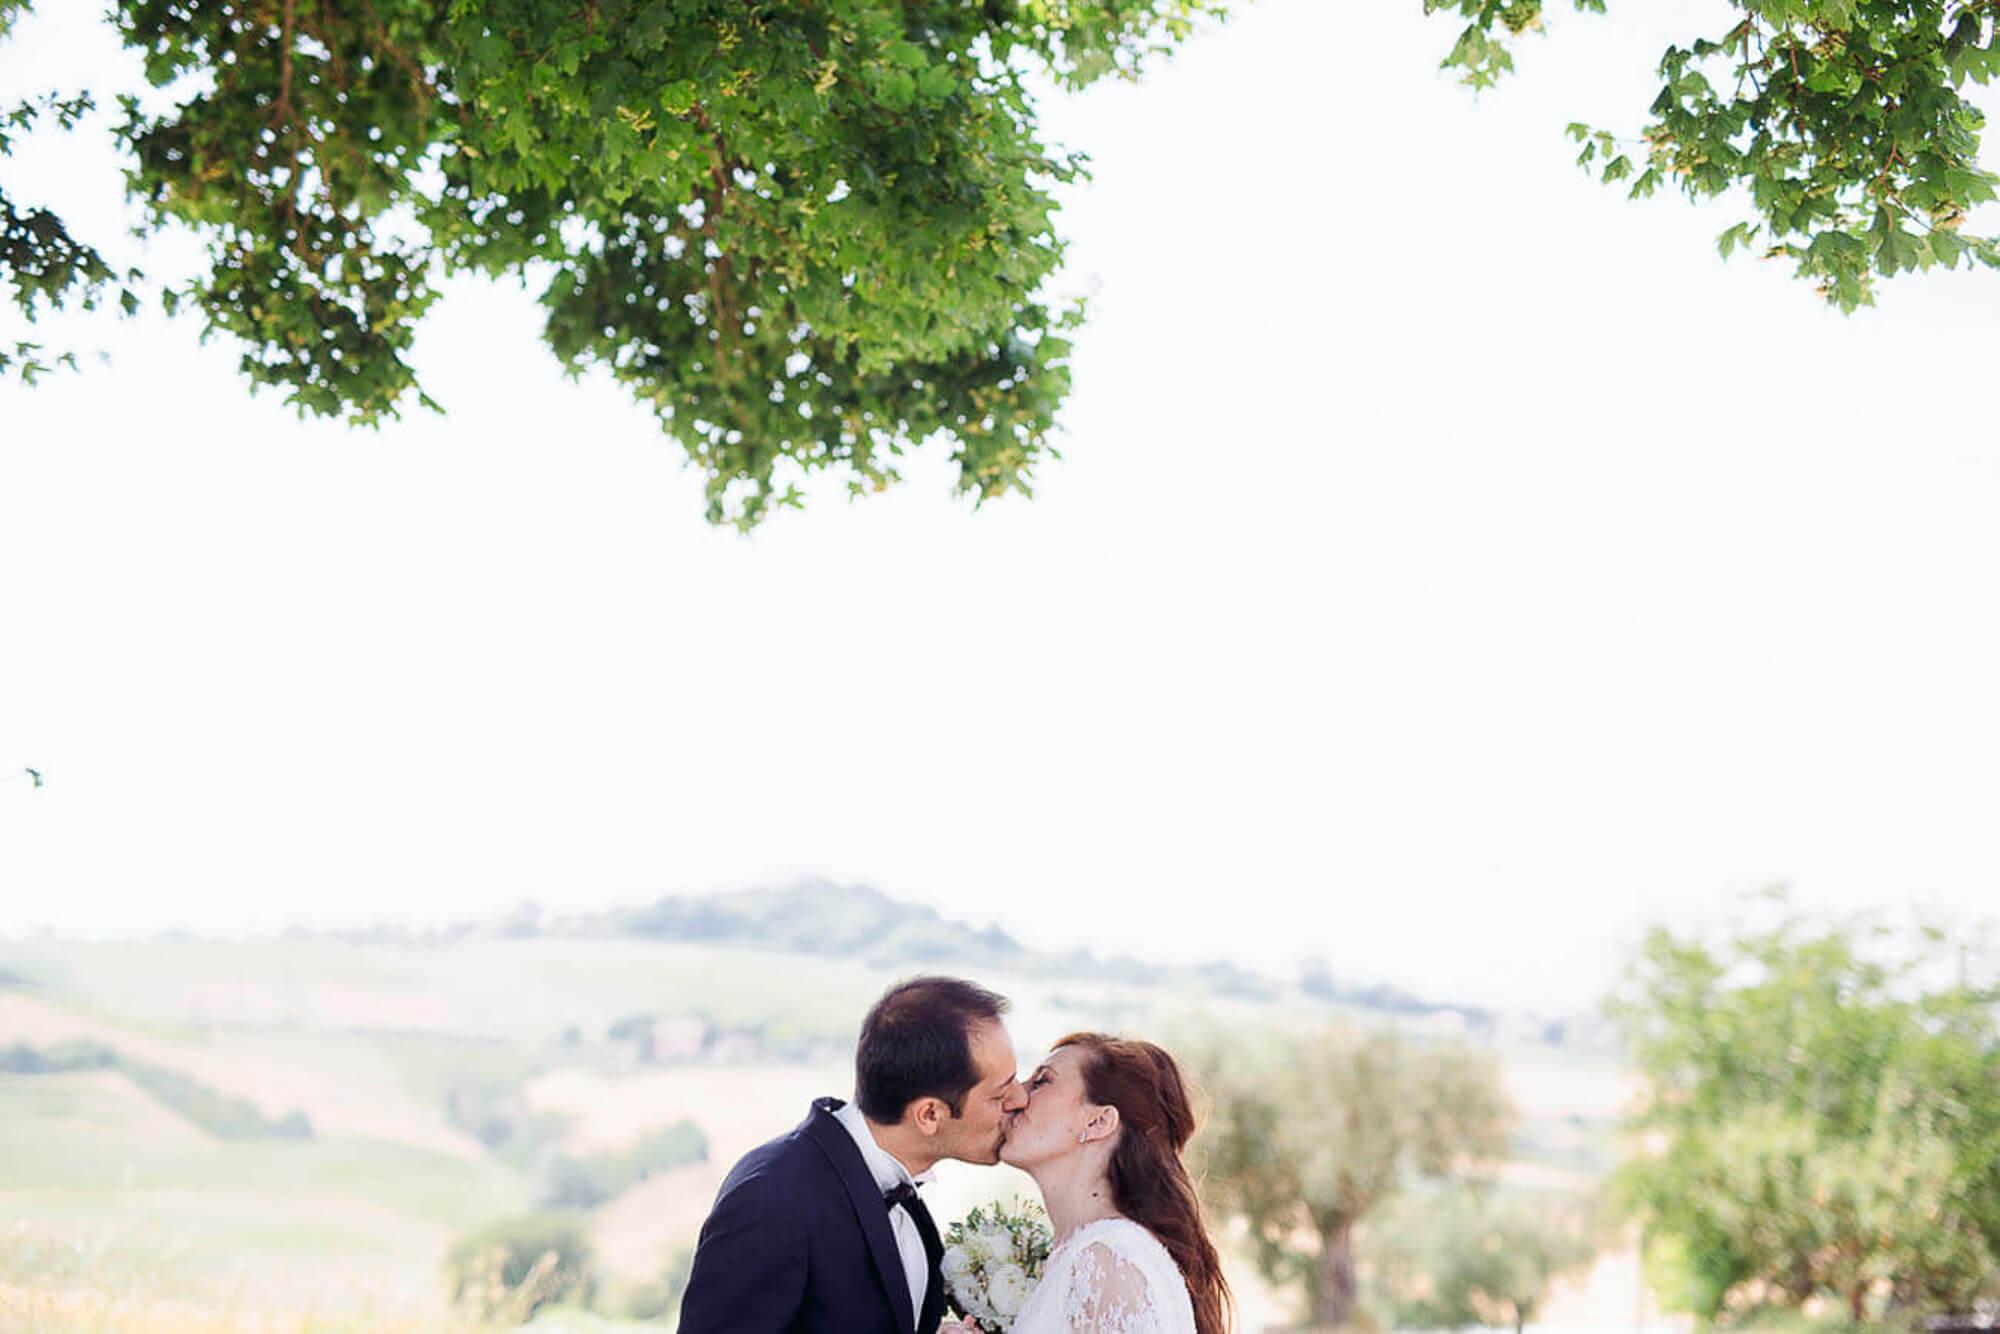 102_wedding_destination wedding creative portait photographer.jpg